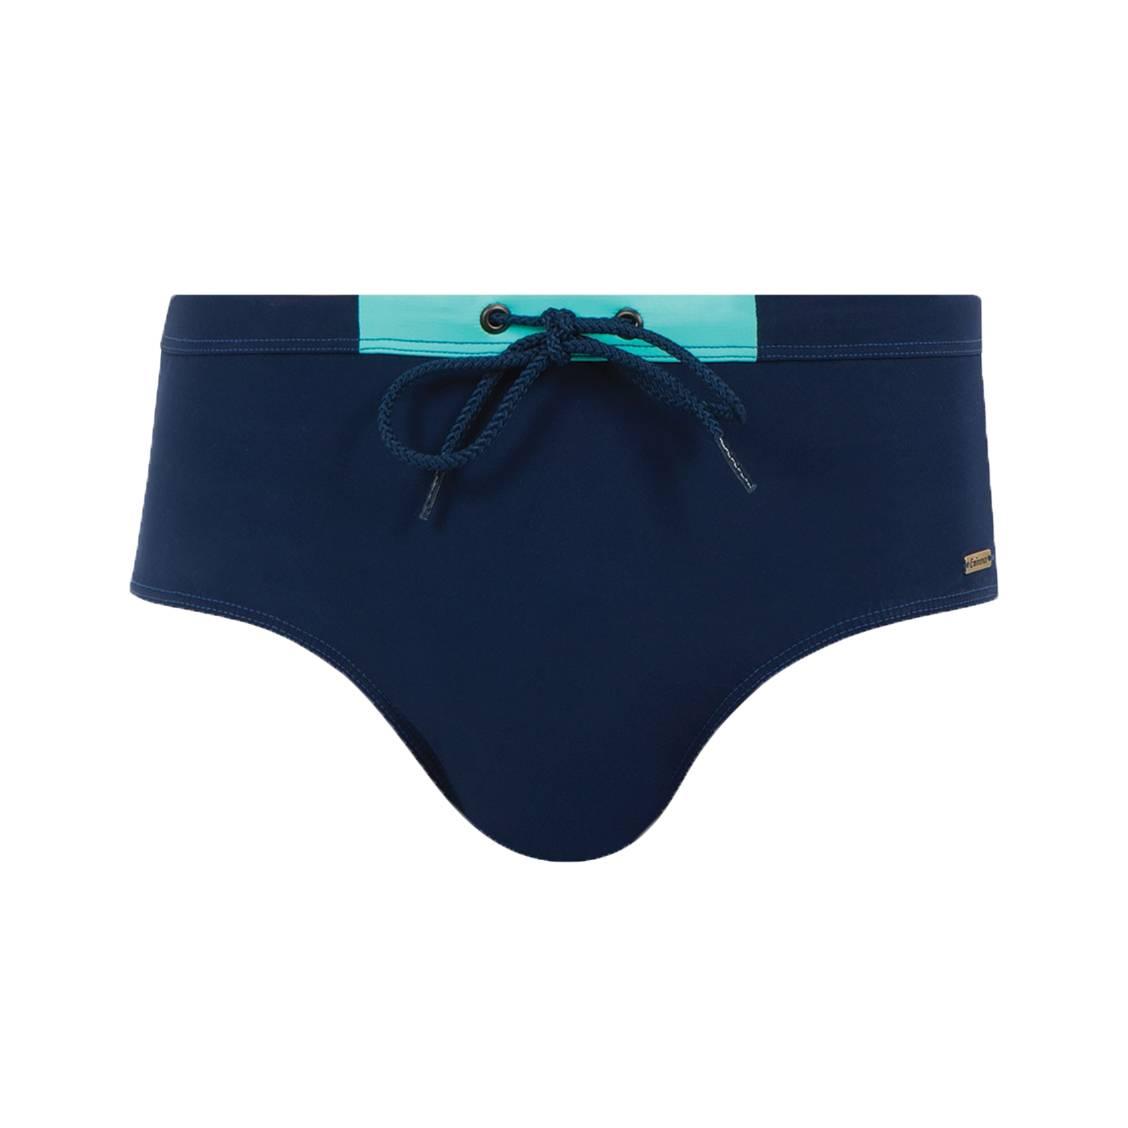 Slip de bain Eminence bleu marine à détails vert d'eau